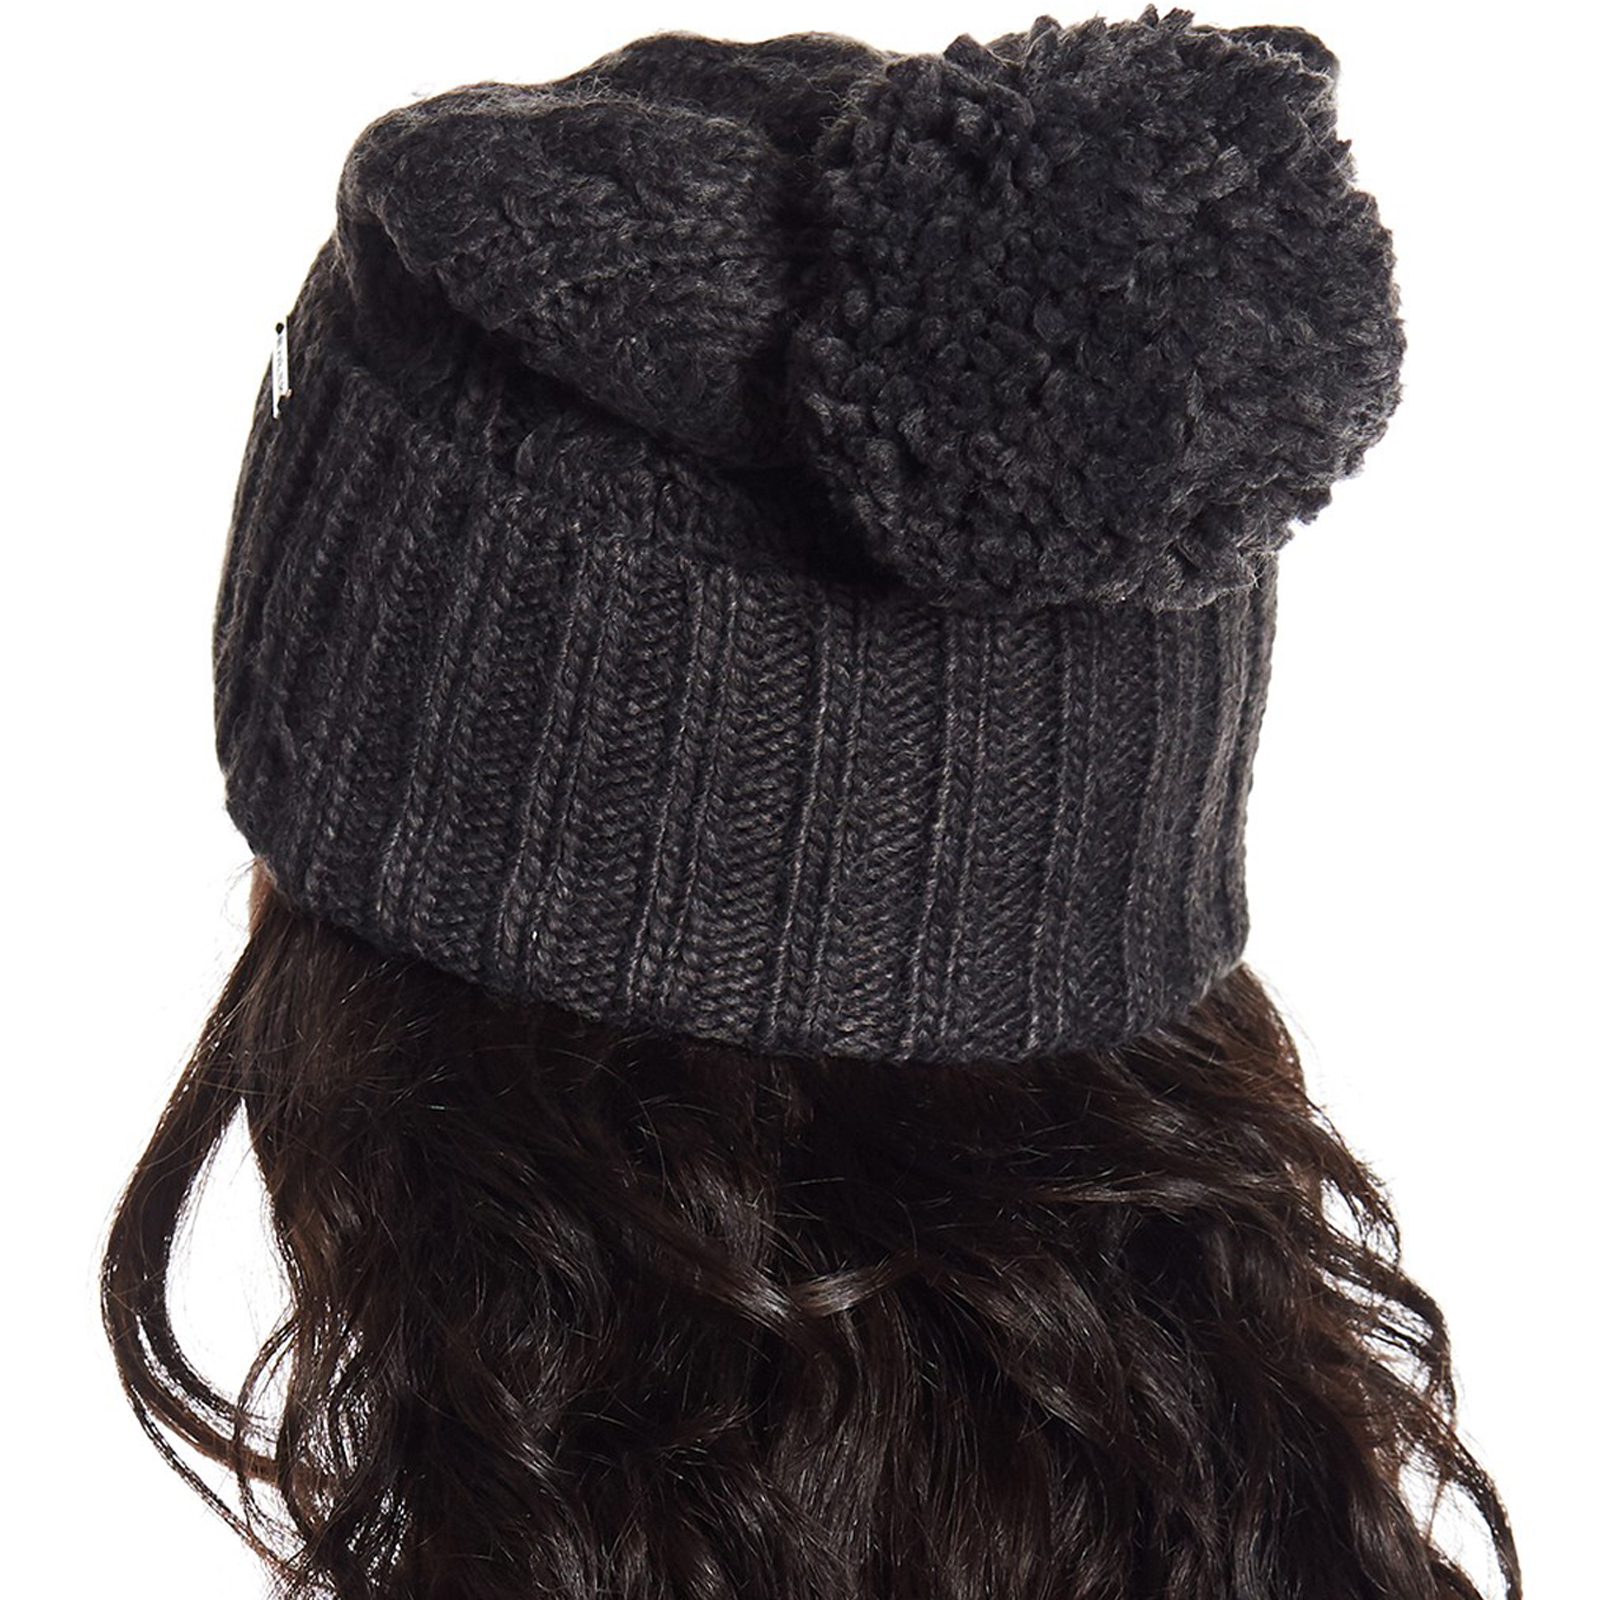 Pungles - Online Store - Cable Rib Knit Cuffed Pompom Grey Beanie Hat b3b76c03a68